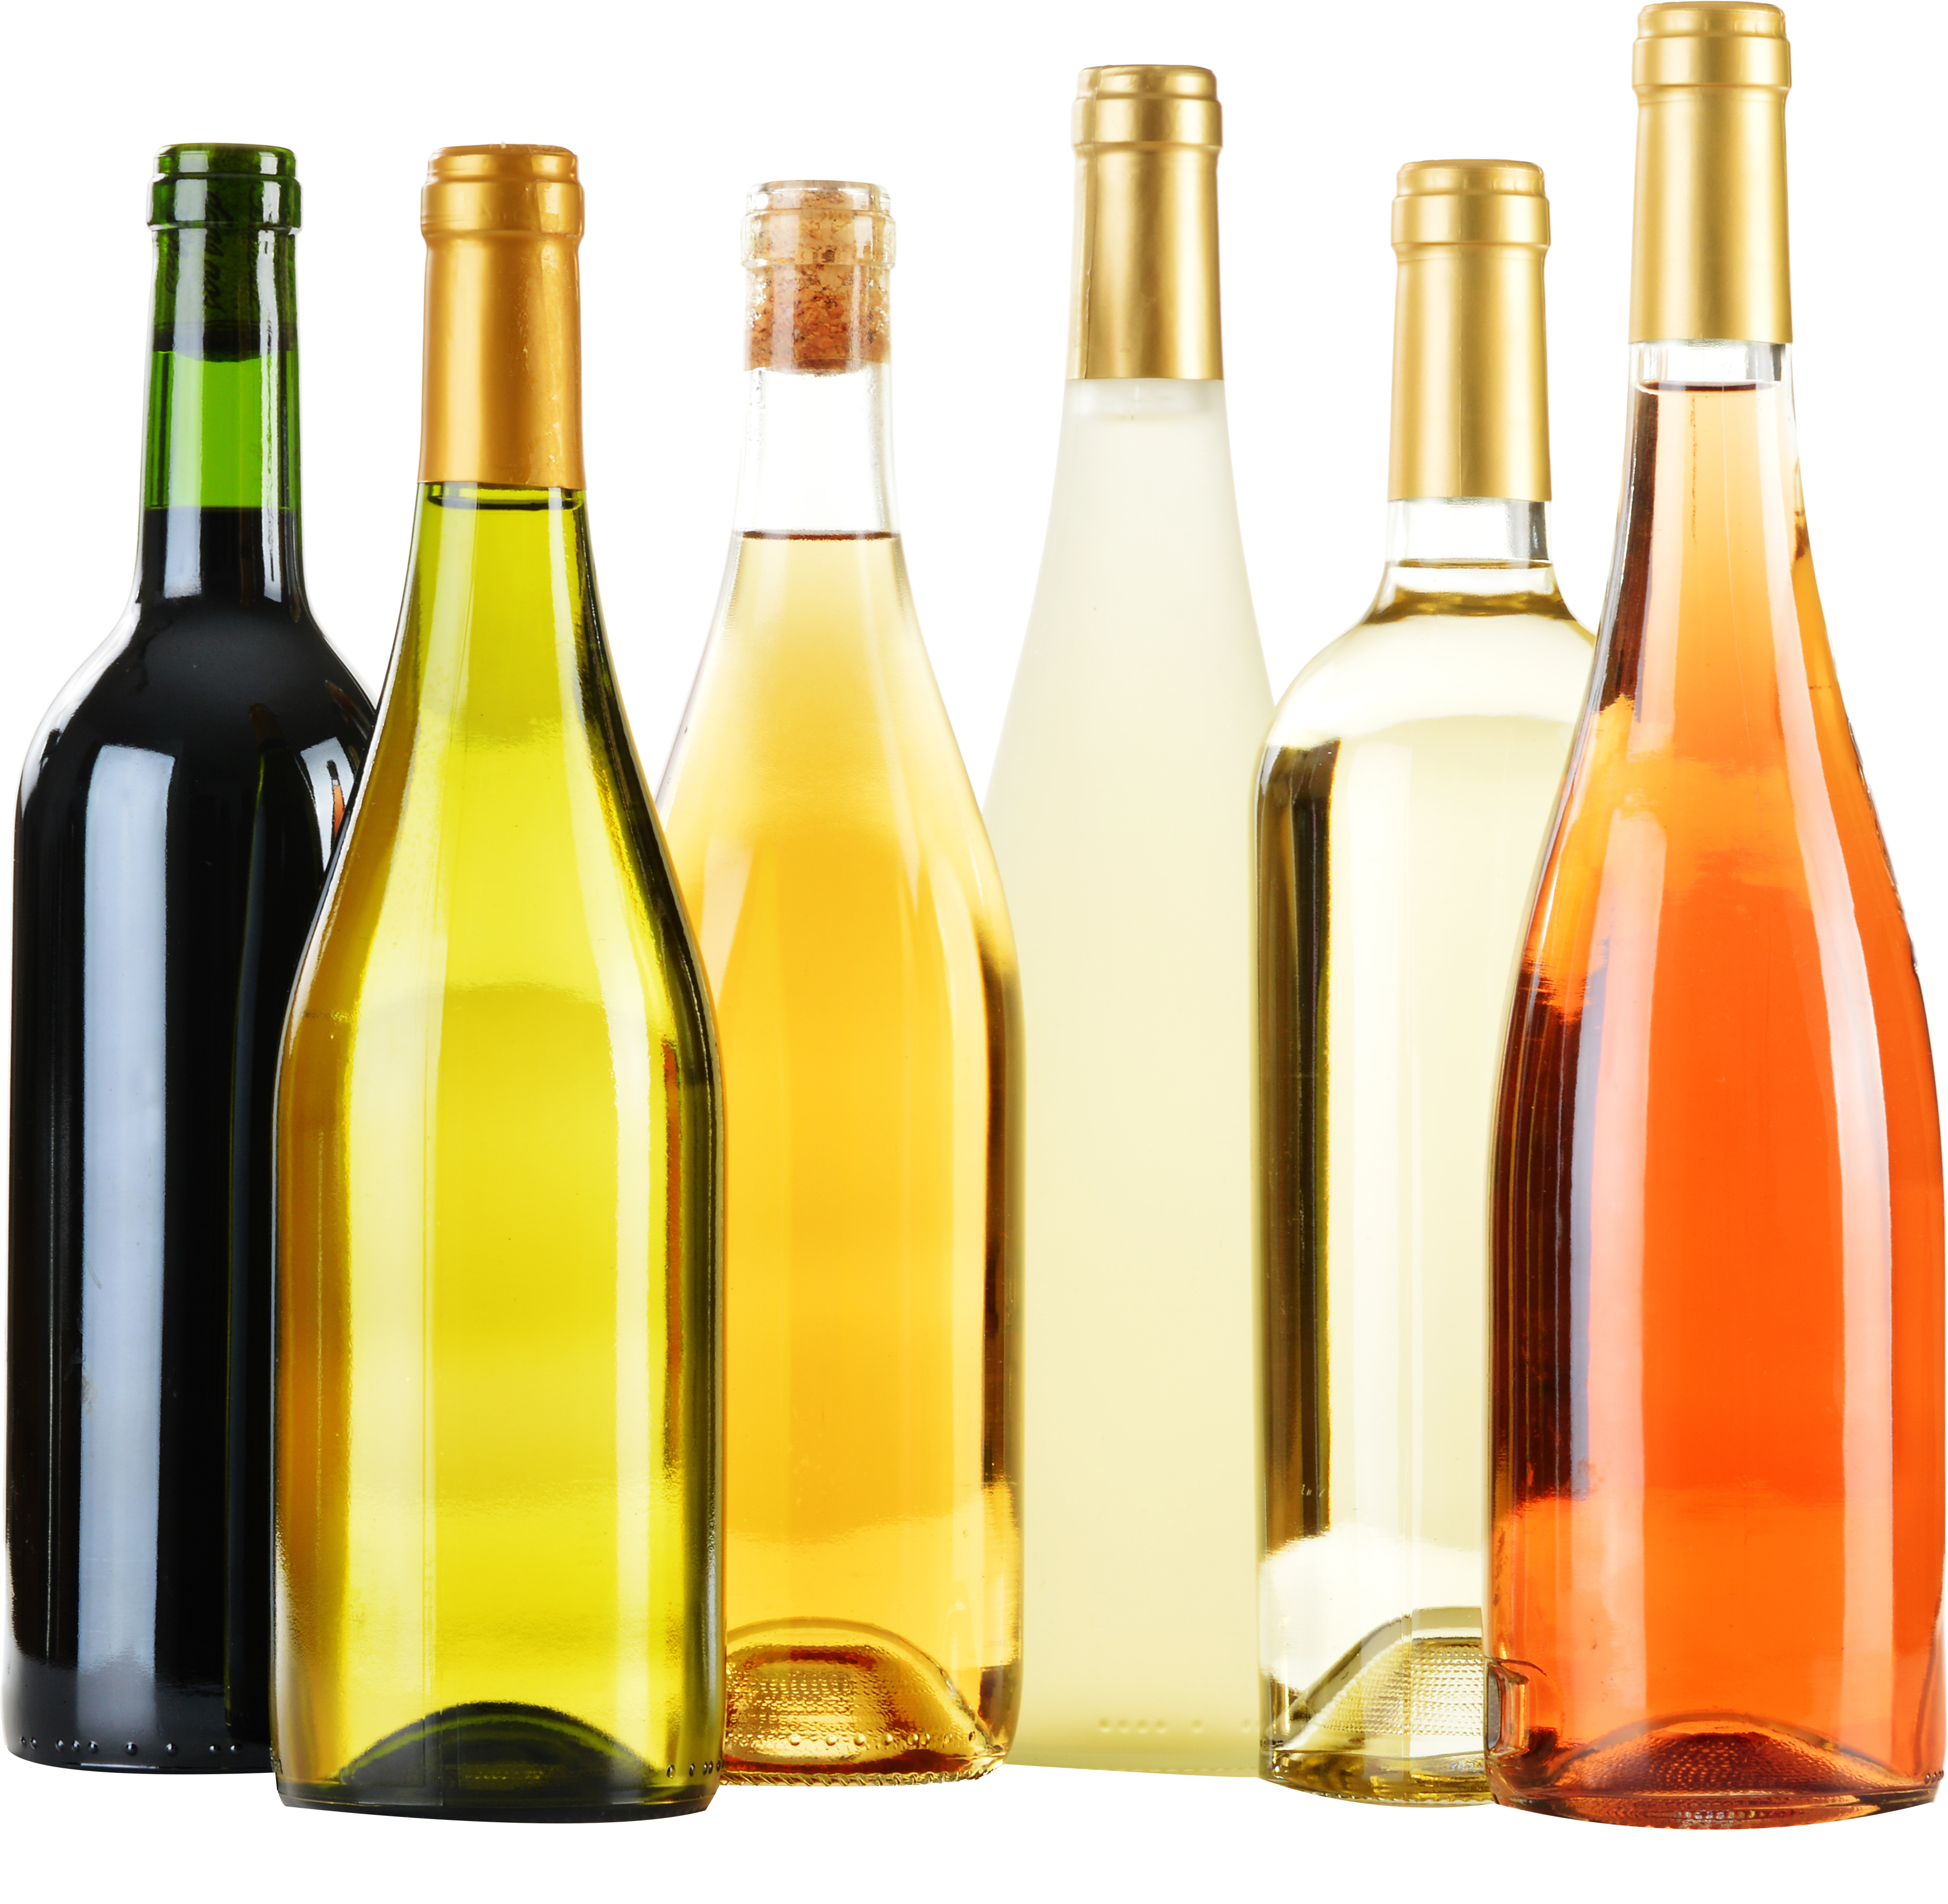 Champagne bottle label clip. Pineapple clipart wine